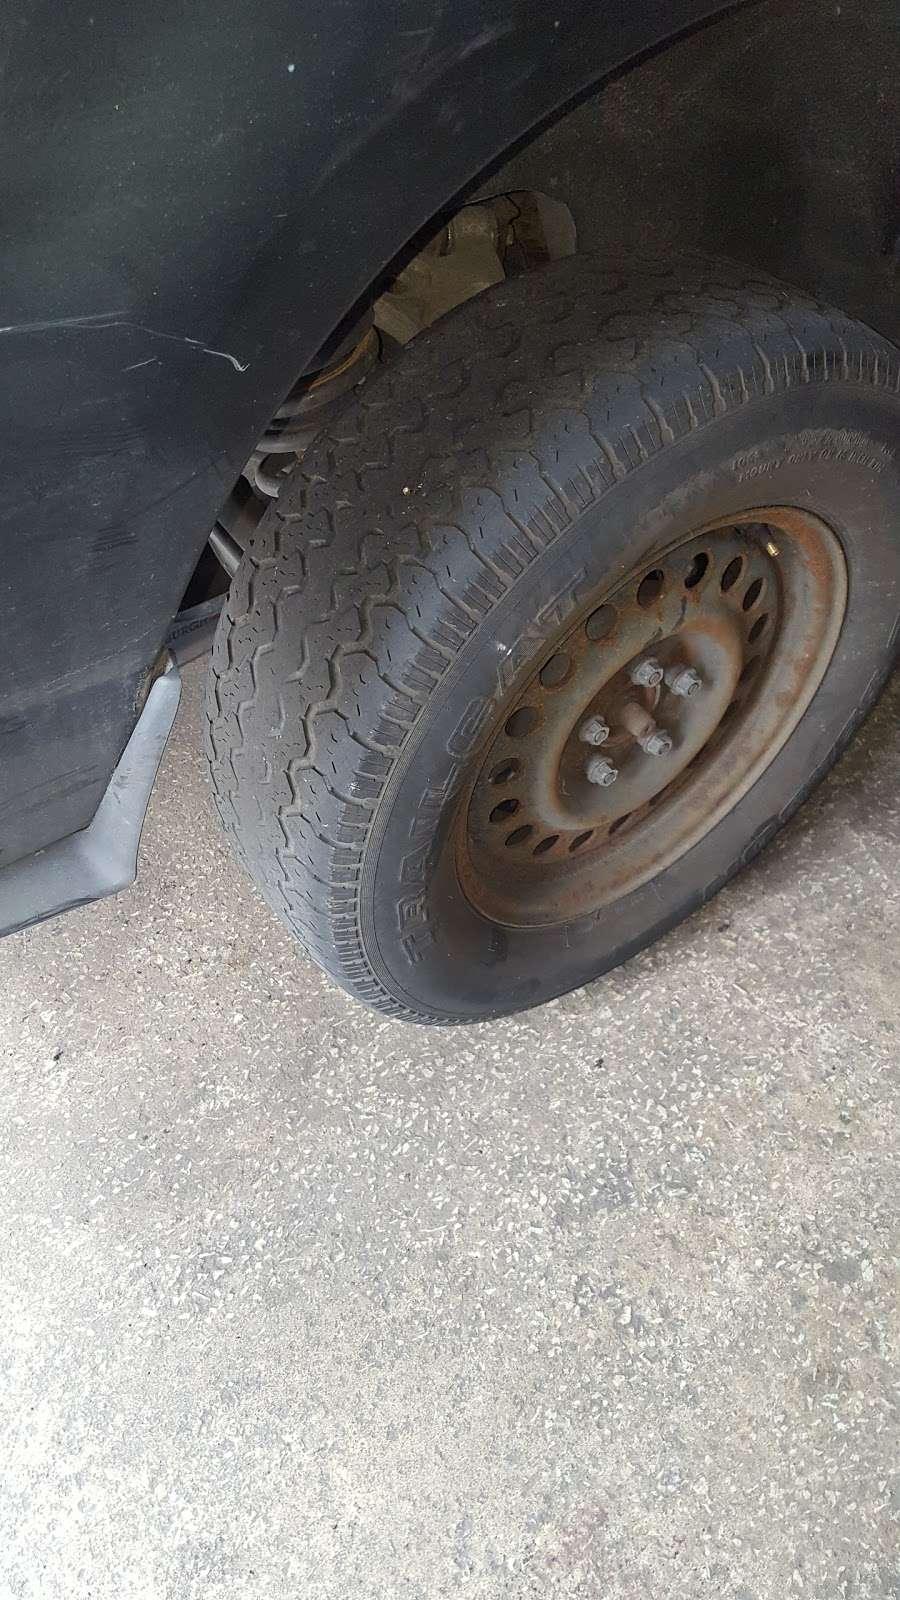 24 Hr Tire Shop - car repair  | Photo 5 of 7 | Address: 4673 N 6th St, Philadelphia, PA 19140, USA | Phone: (215) 455-9559